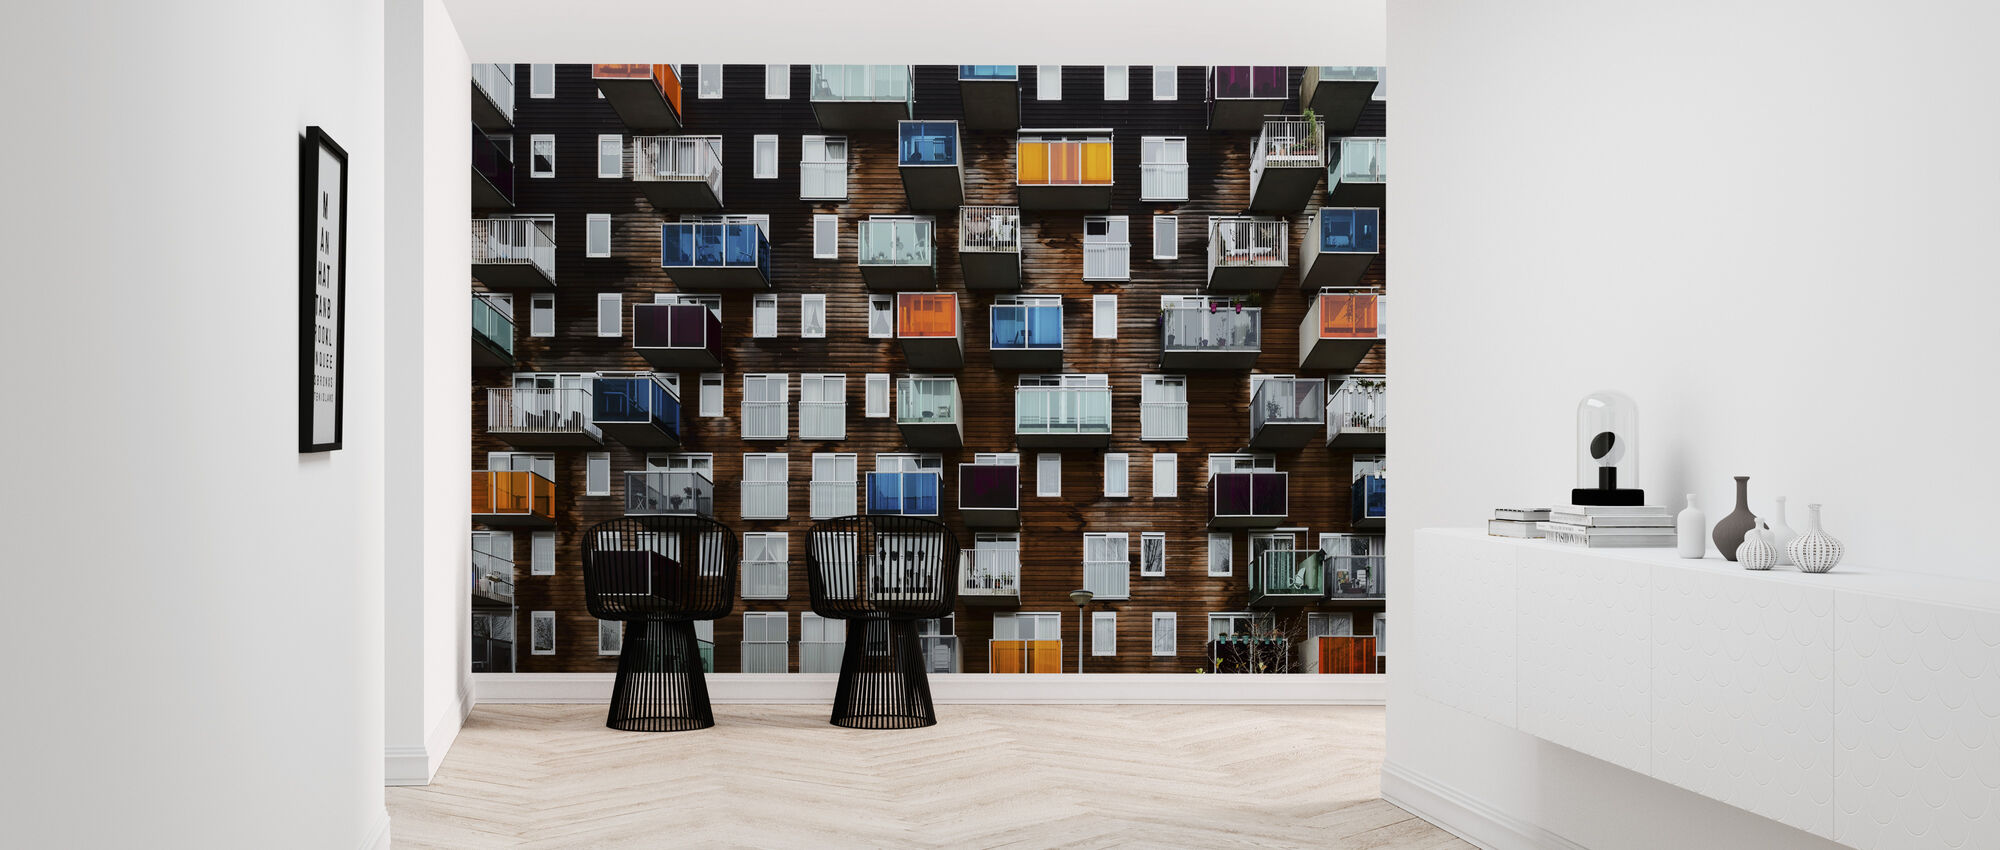 Balconia - Wallpaper - Hallway